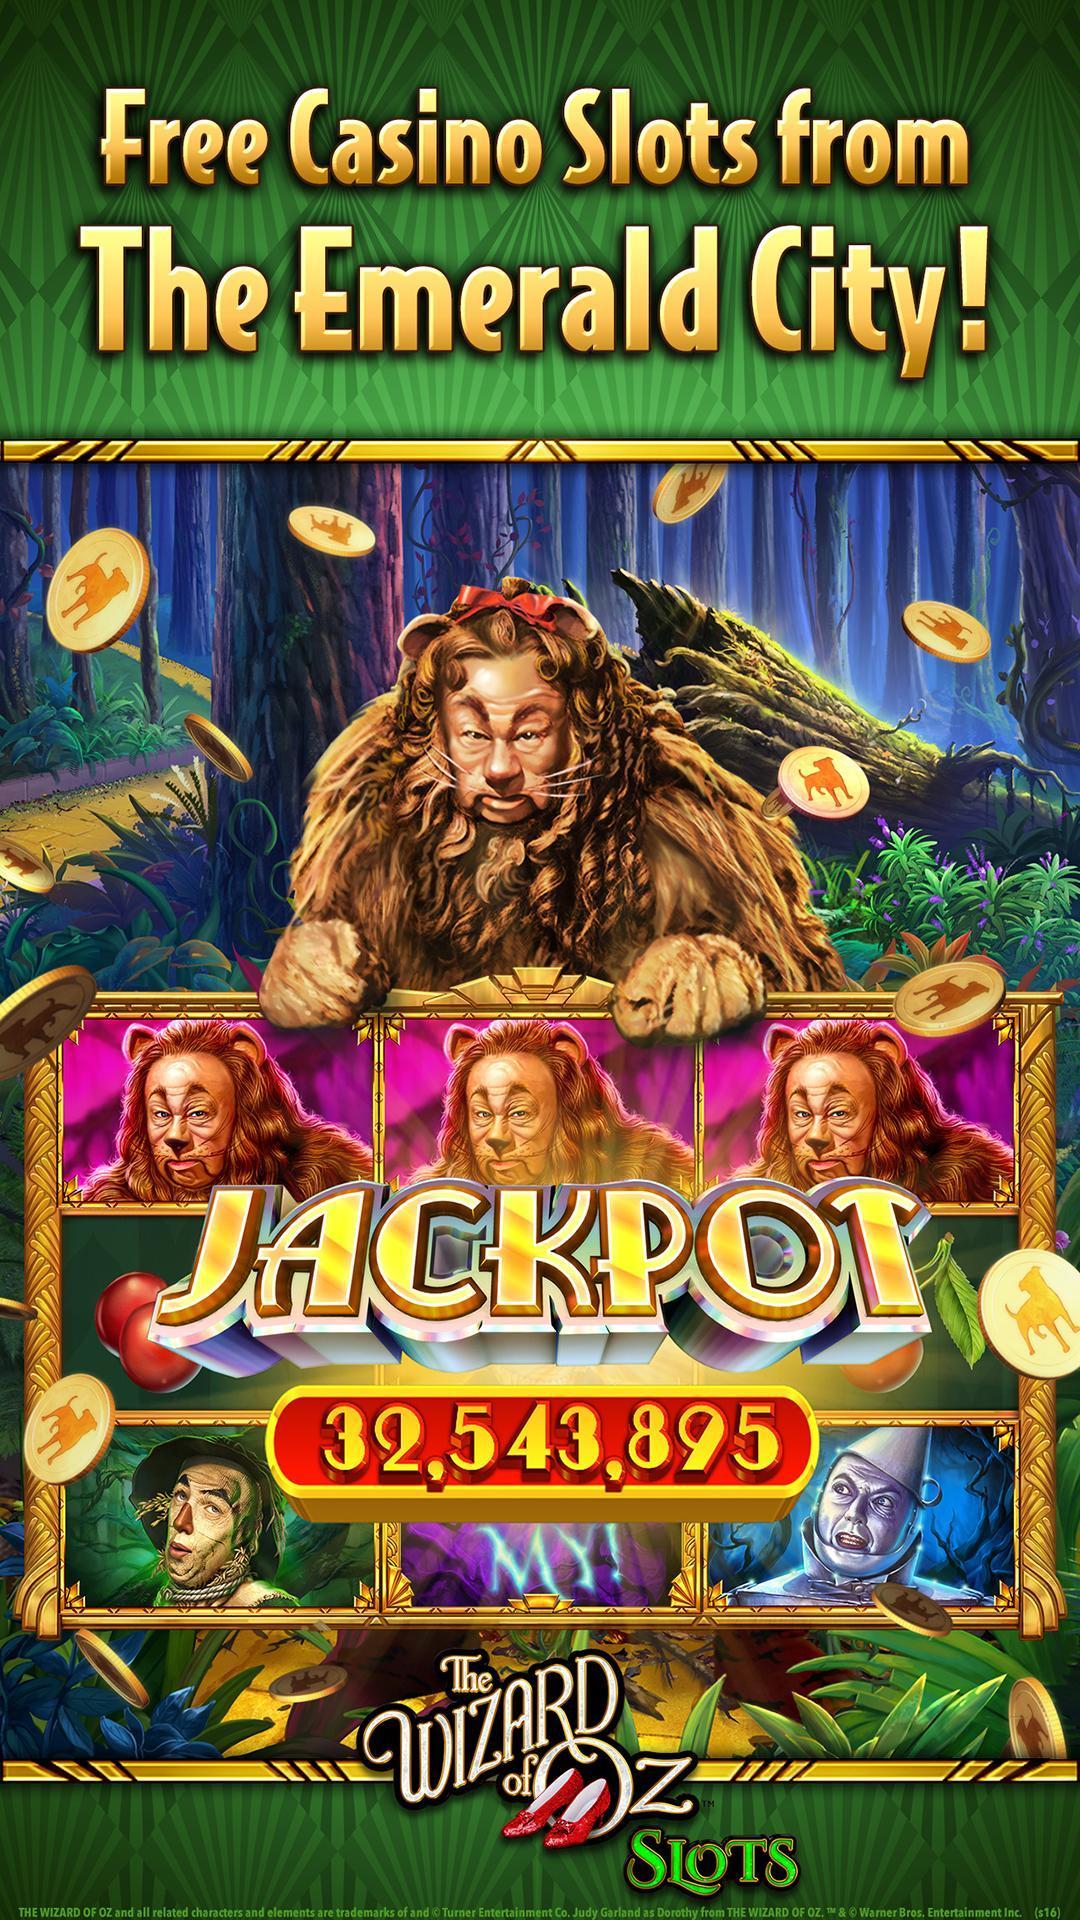 Wizard of Oz Free Slots Casino 134.0.2045 Screenshot 5